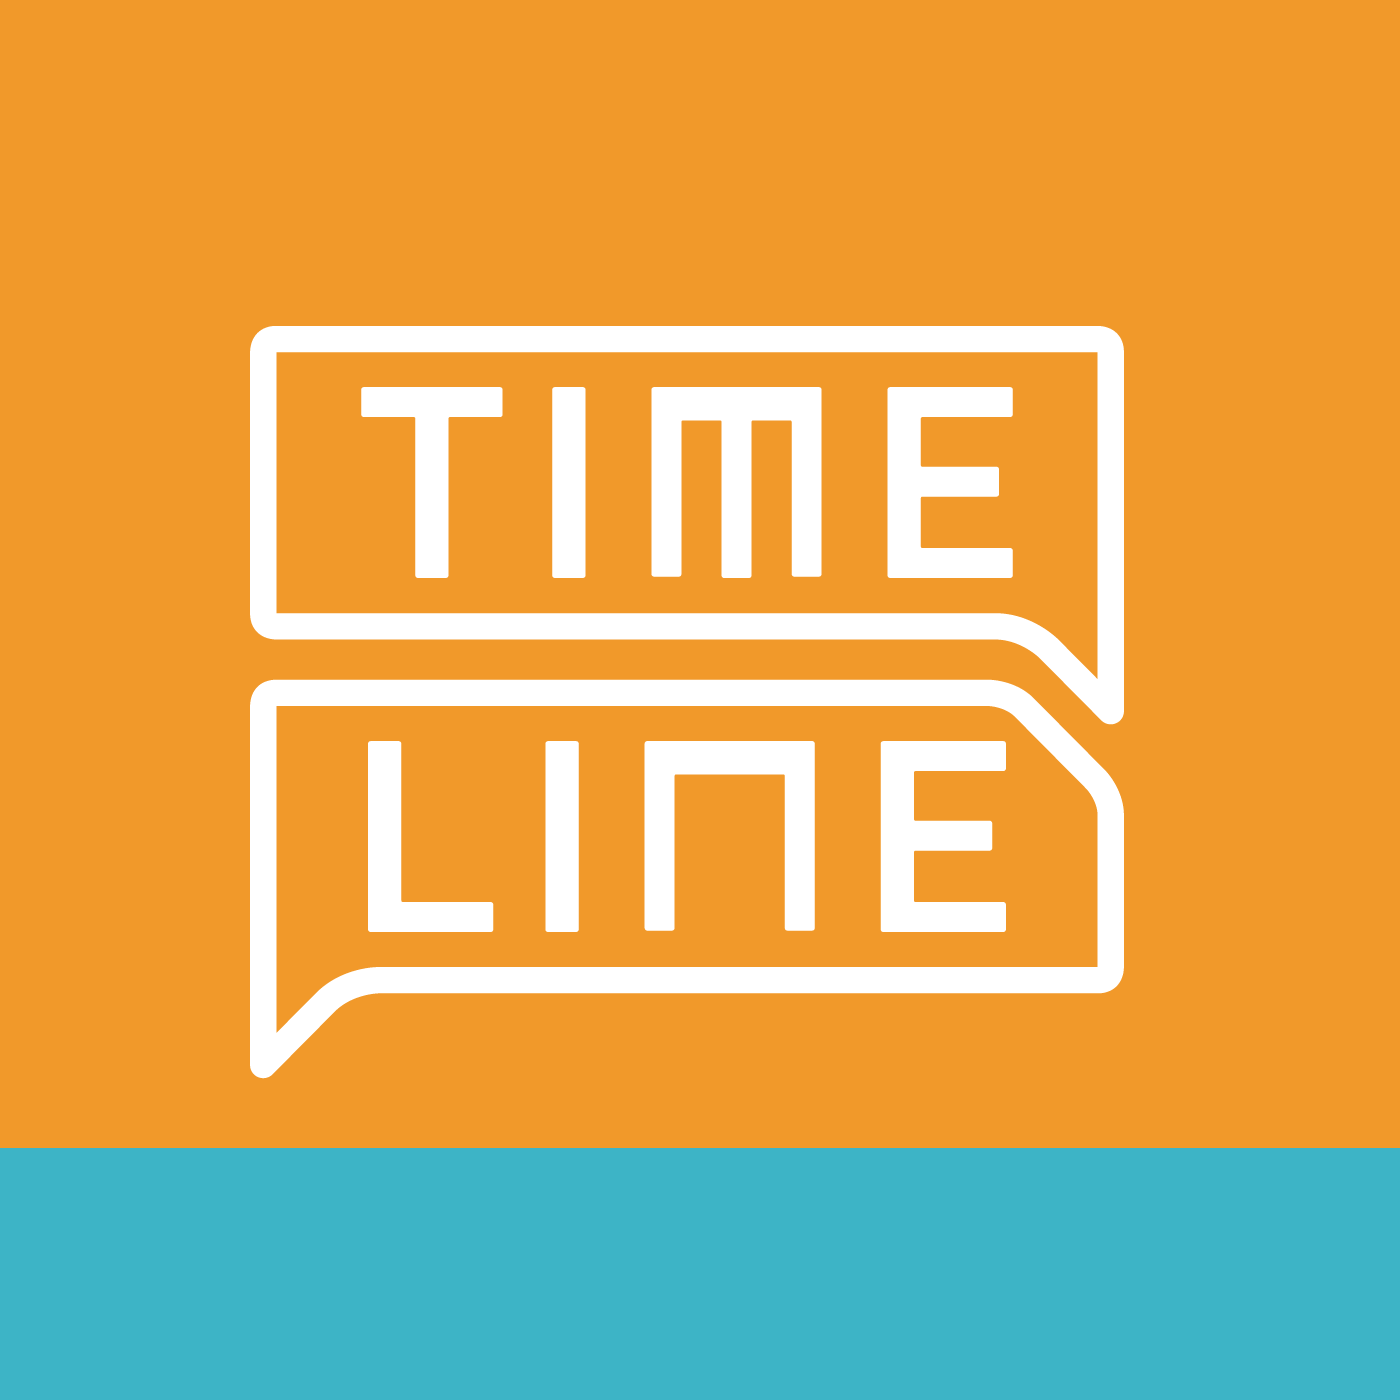 Timeline Gaúcha 23/11/2017